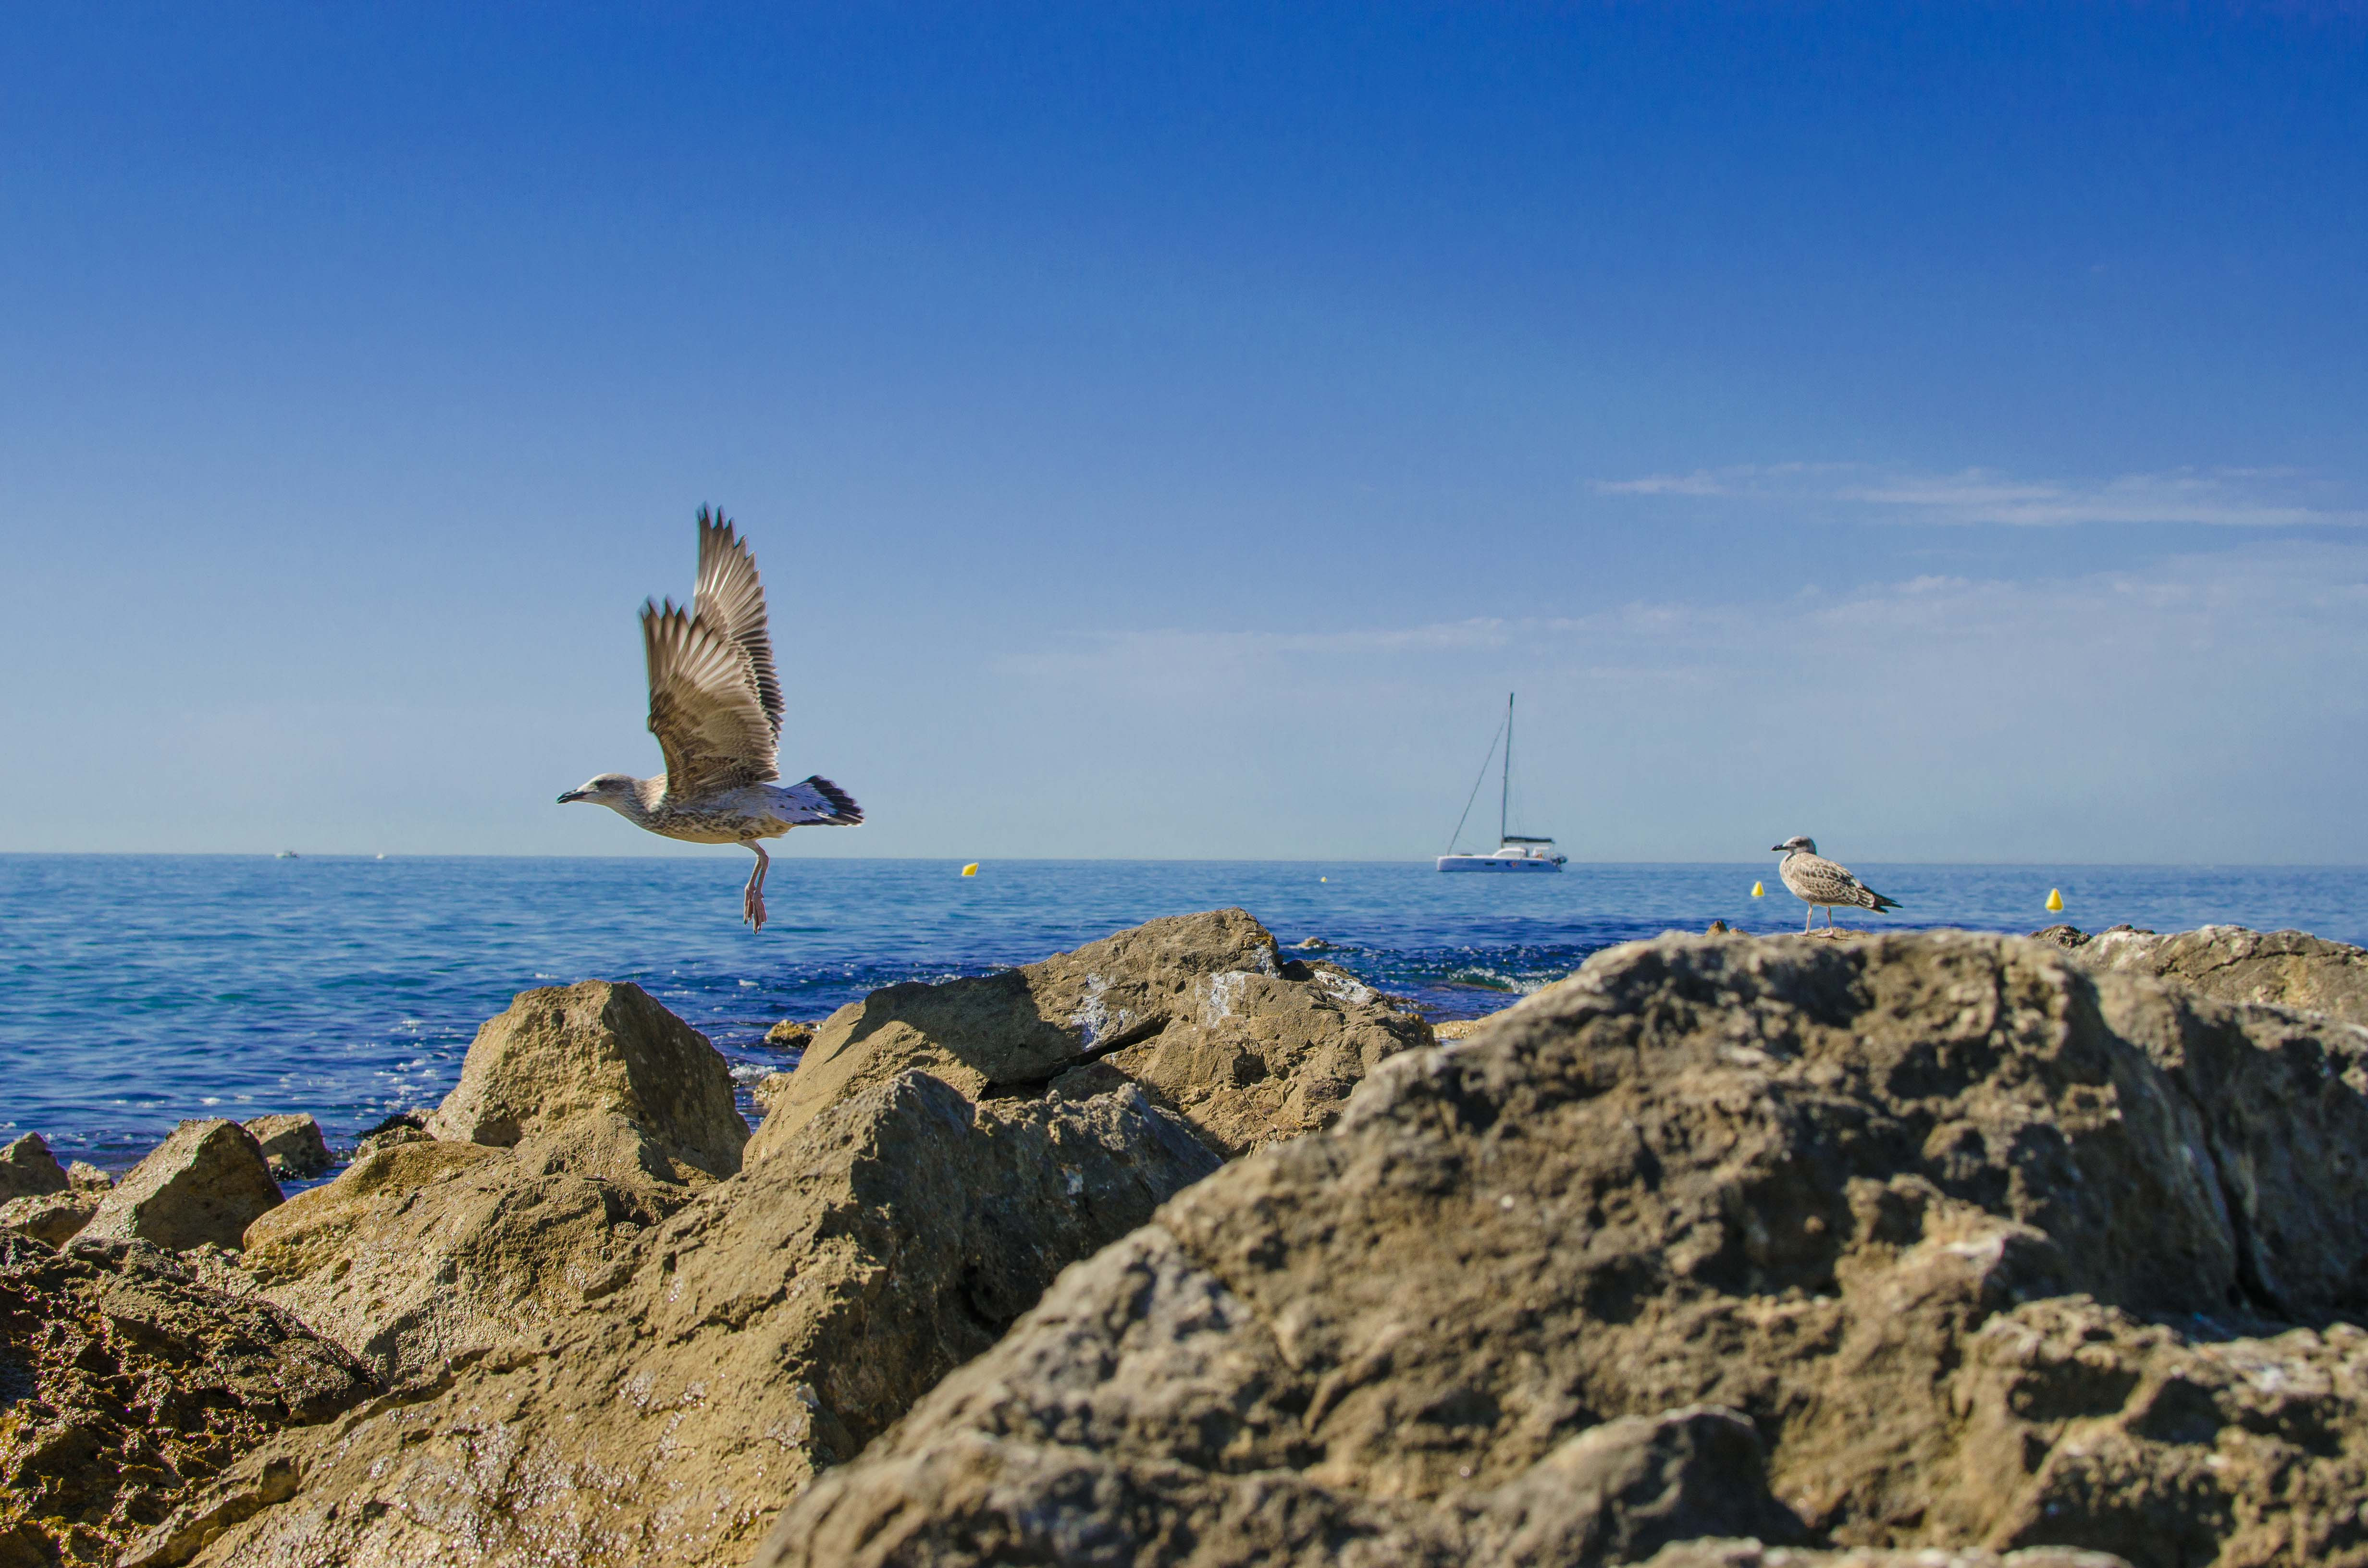 provenza37 Vacanze in Provenza, Camargue e Costa Azzurra